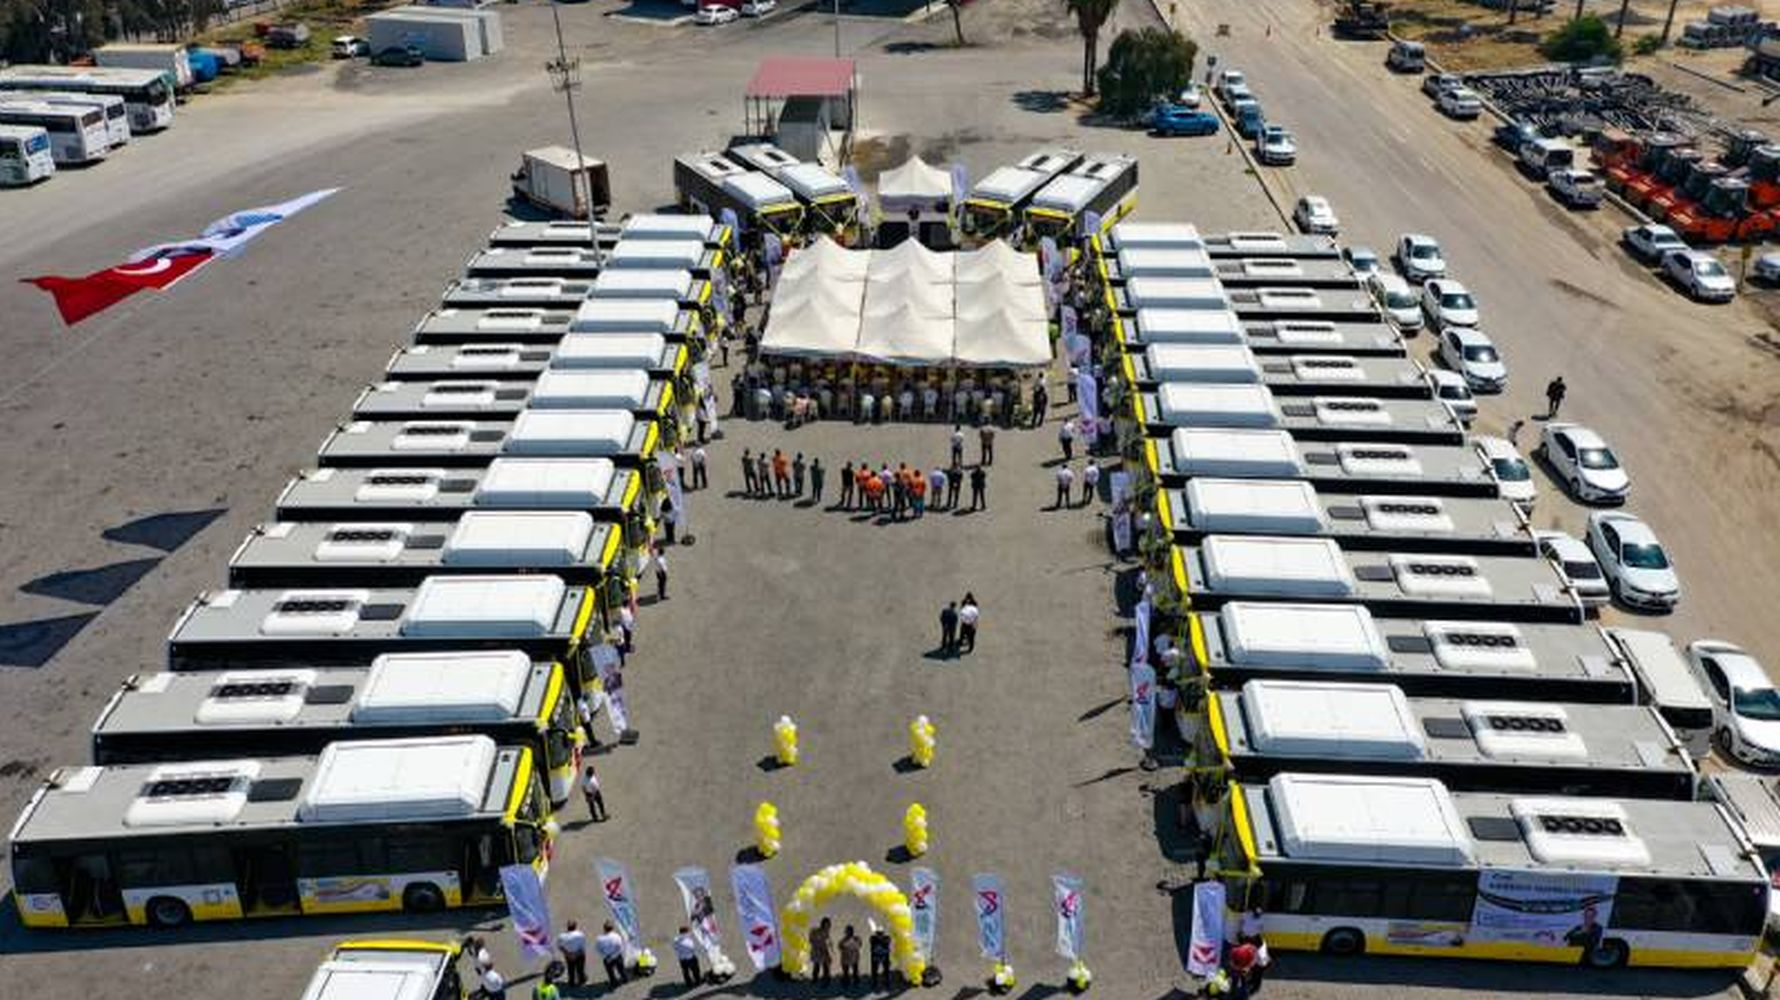 delivery of cngli menarinibus citymood from karsan to Mersin